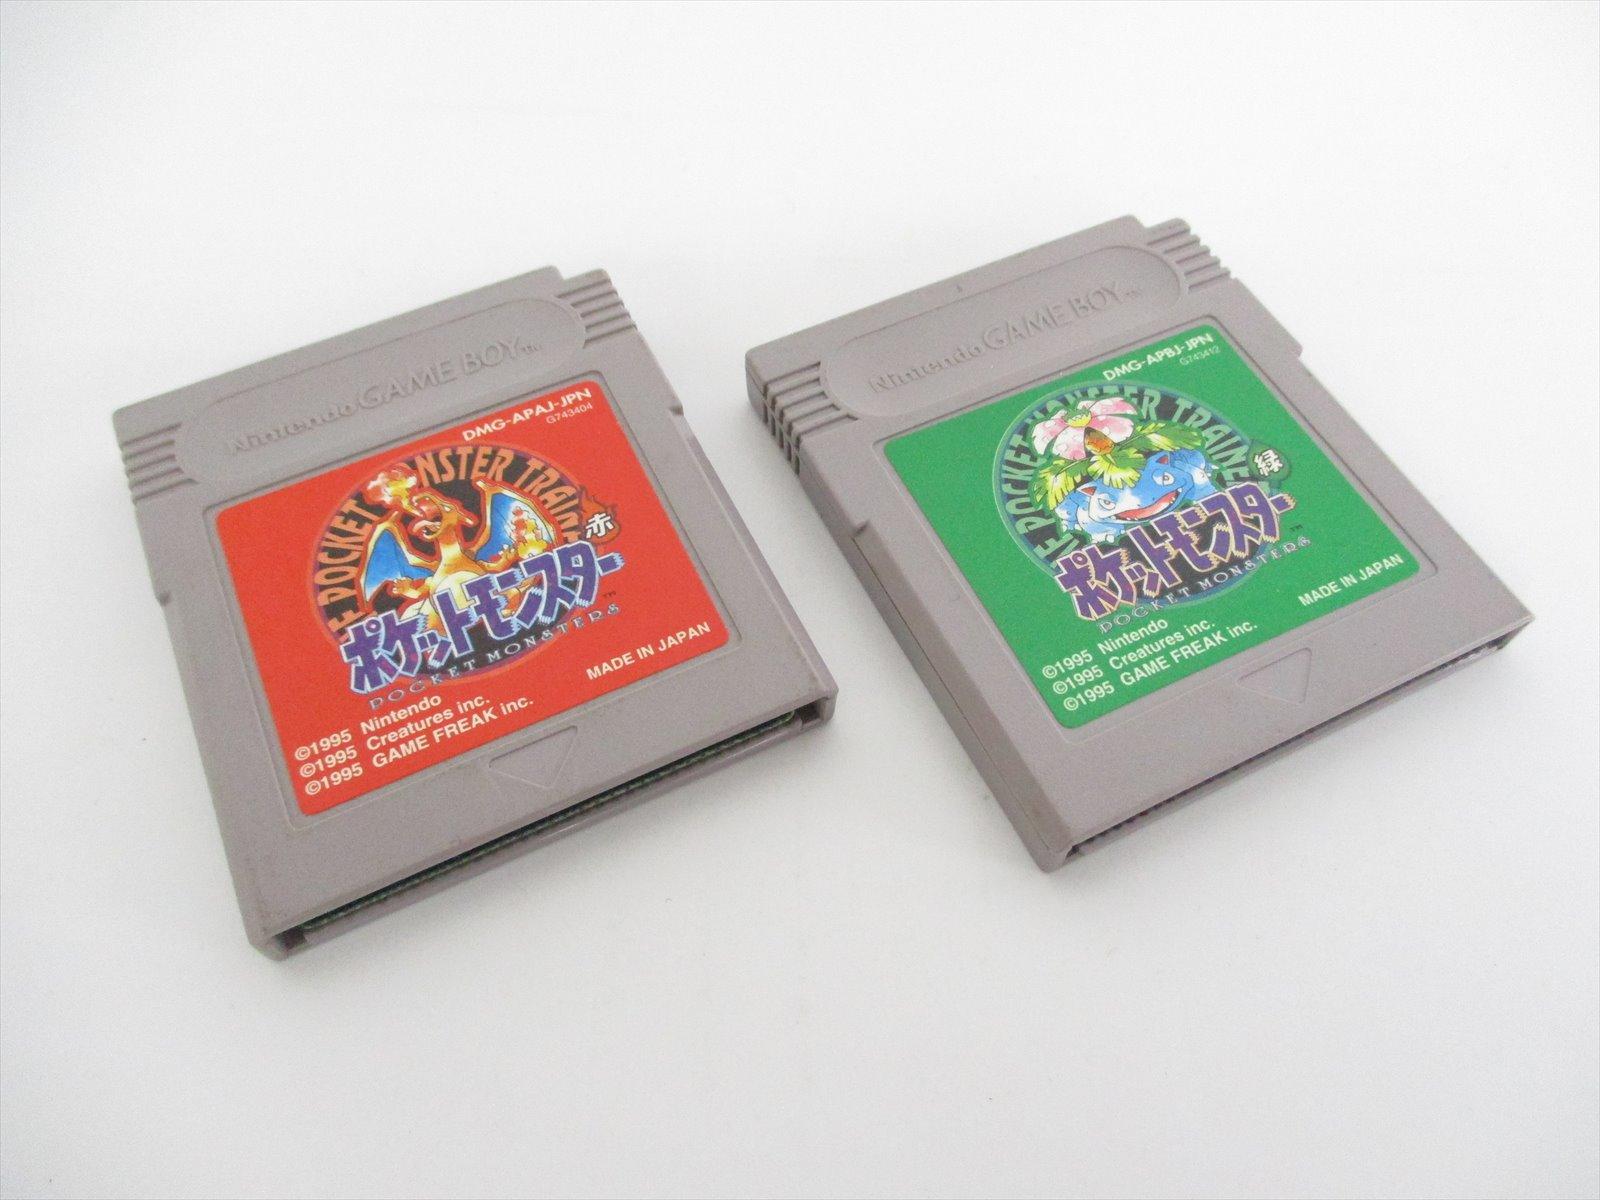 Pokemon Rot Karte.Details Zu Game Boy Mengenangebot Mit 2 Pokemon Rot Grün Set Aka Nintendo Videospiel Karte